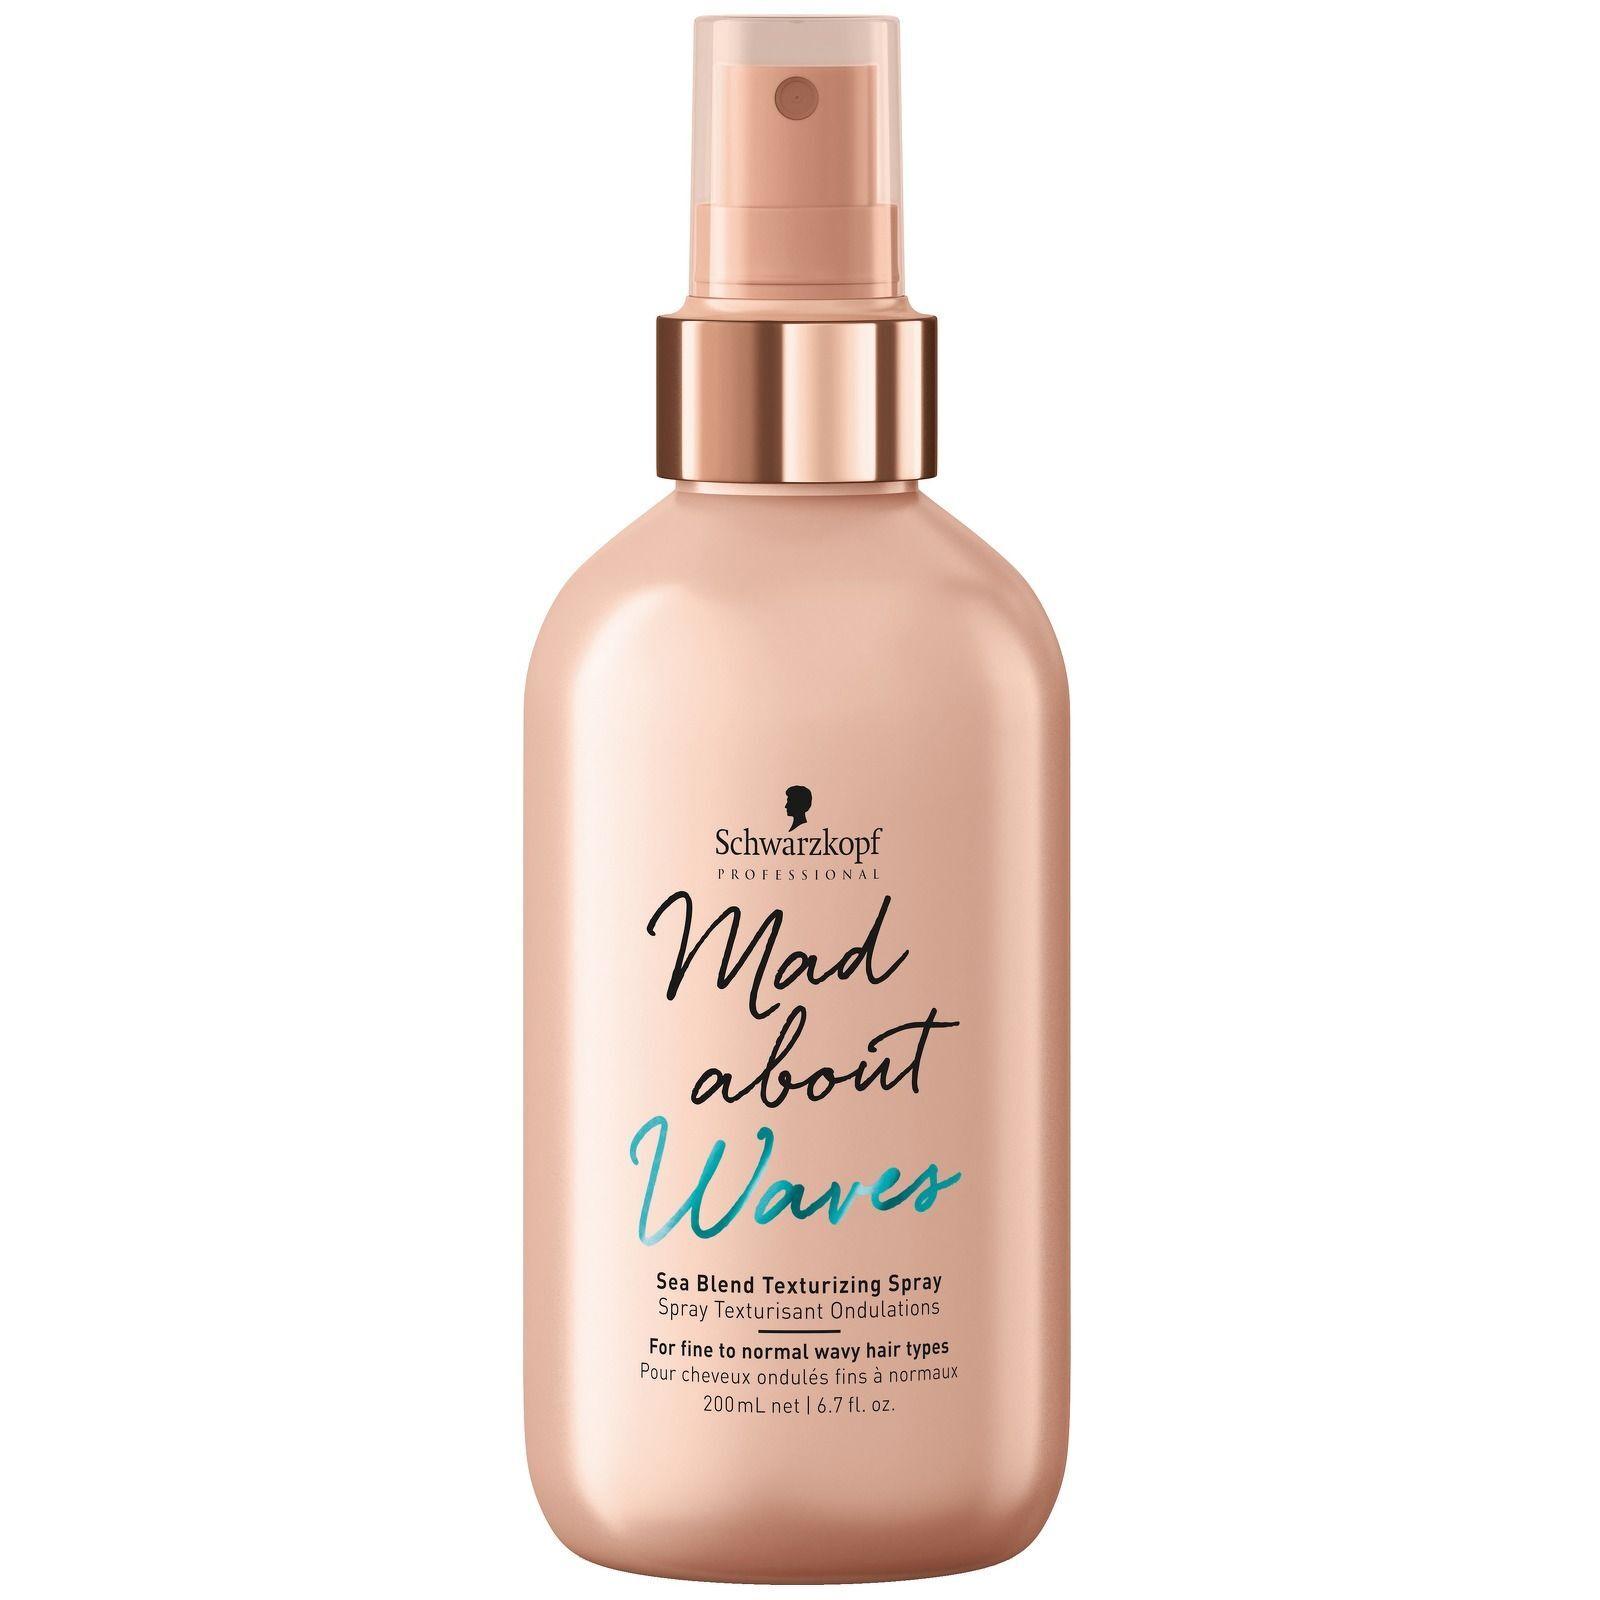 Schwarzkopf - Mad About Waves Sea Blend Texturizing Spray 200ml for Women